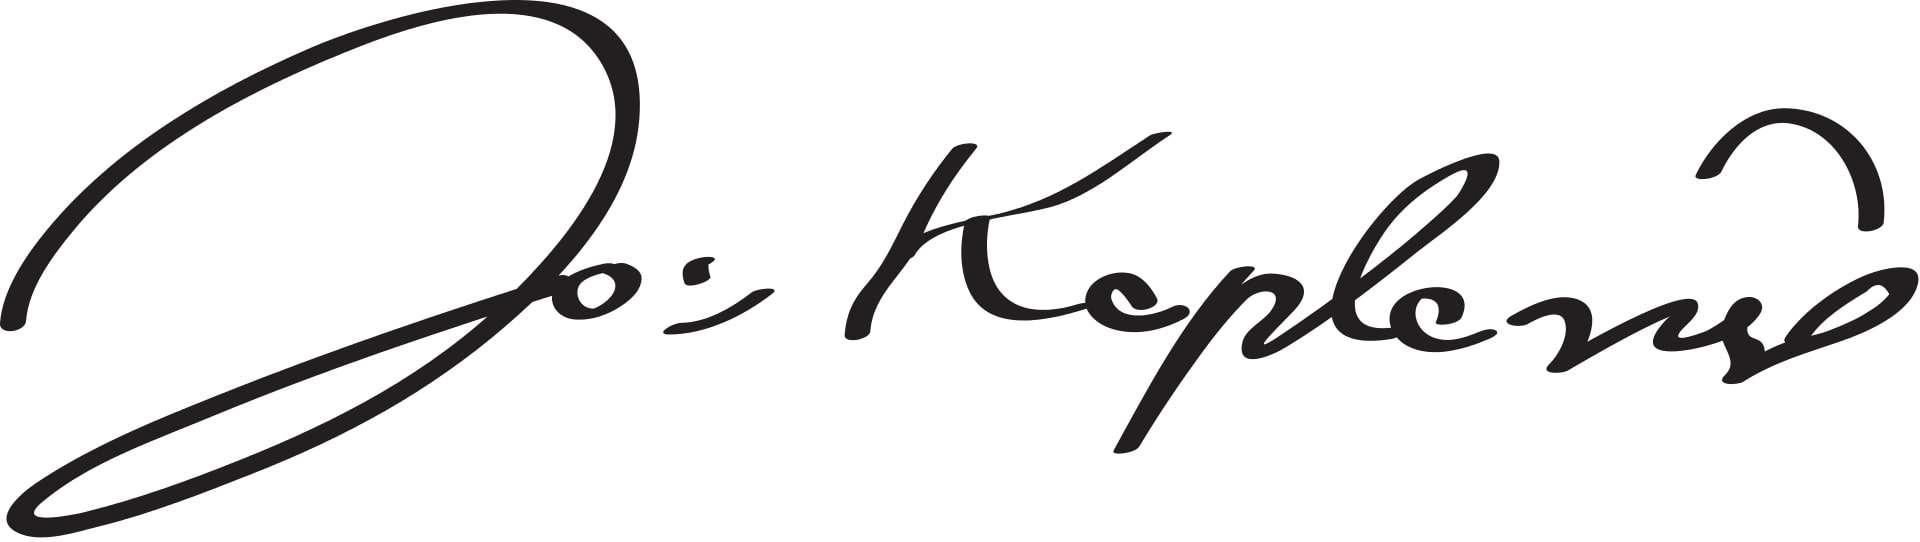 Johannes Kepler Signature